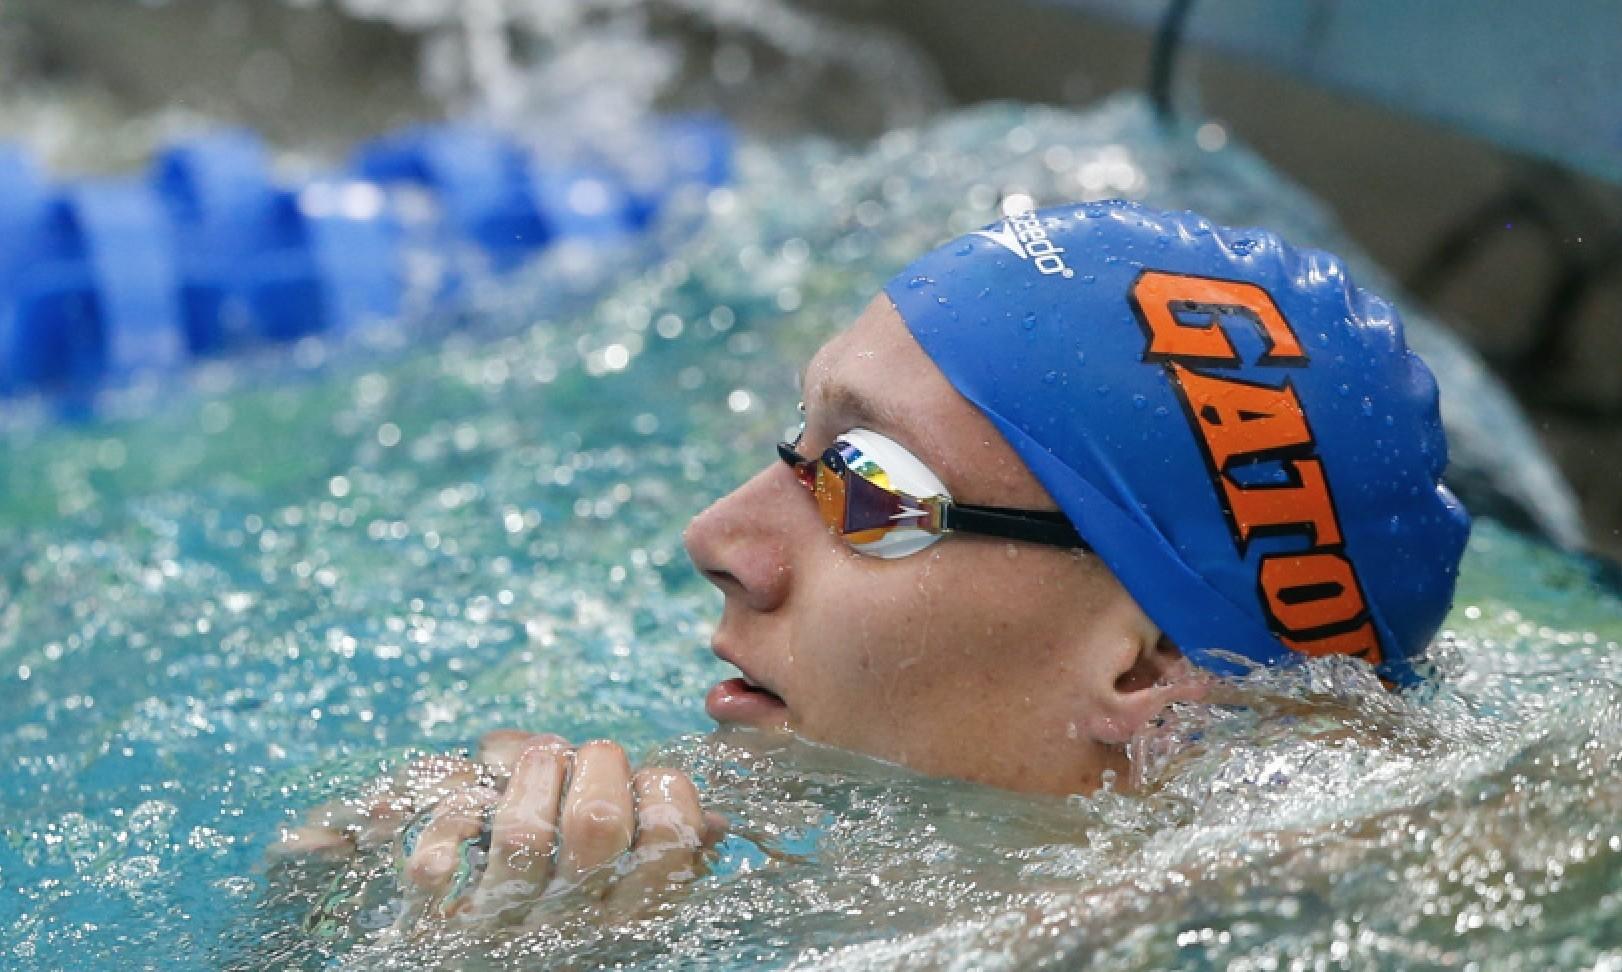 mel zajac swim meet 2012 psych sheet